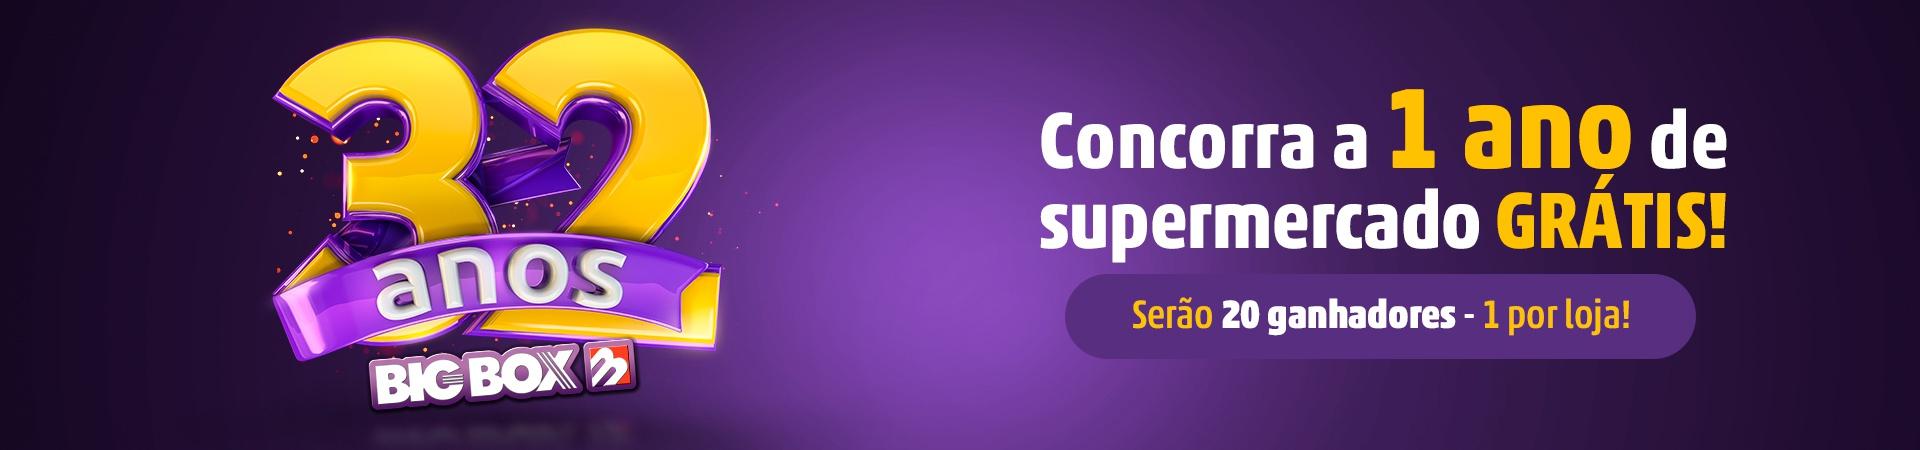 banner web promo